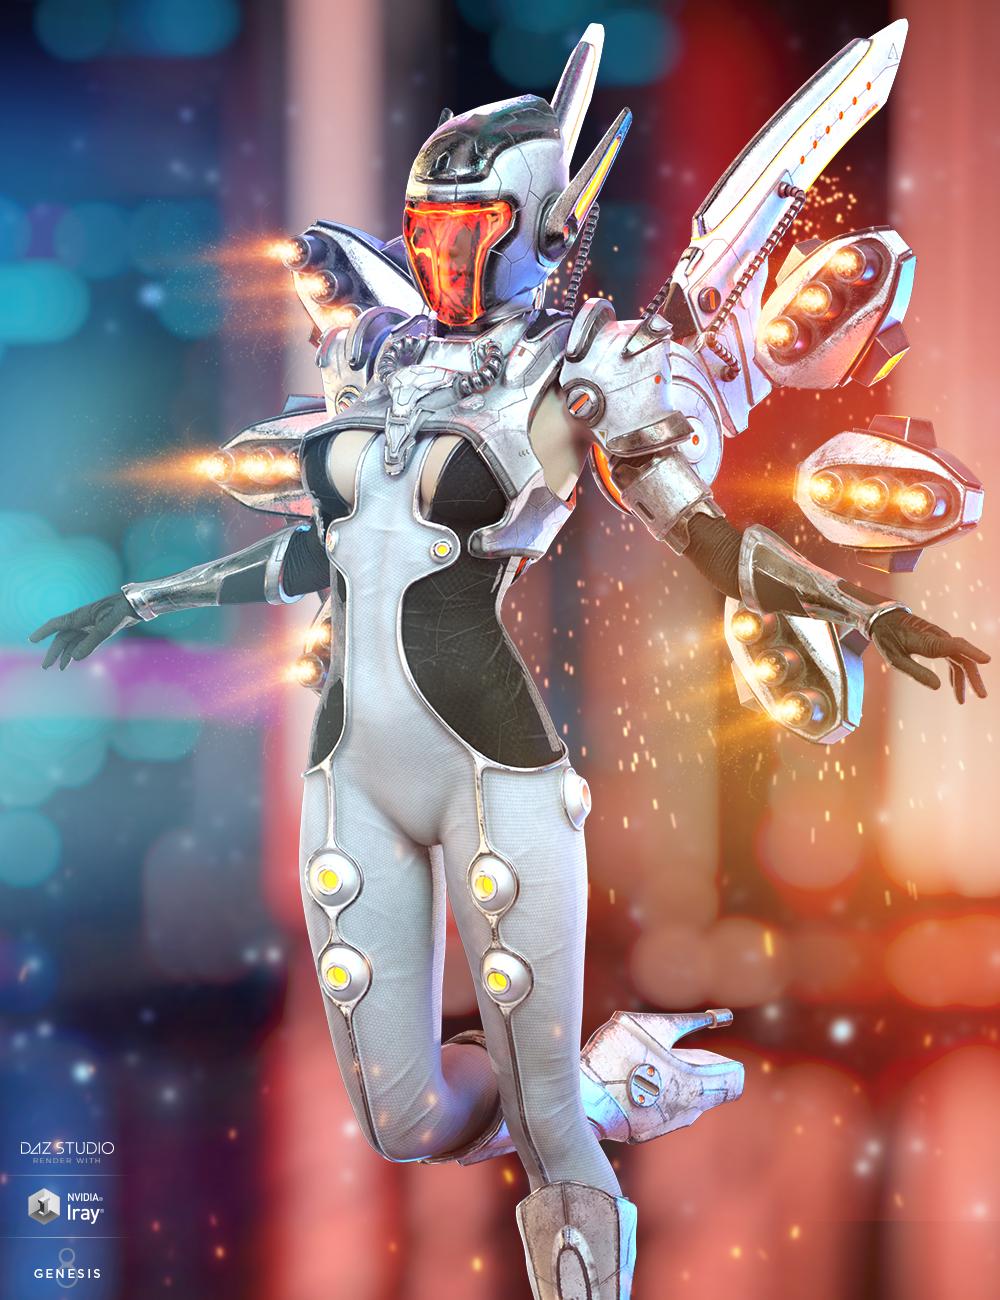 dForce Mech Dancer Outfit for Genesis 8 Female(s) by: HM, 3D Models by Daz 3D